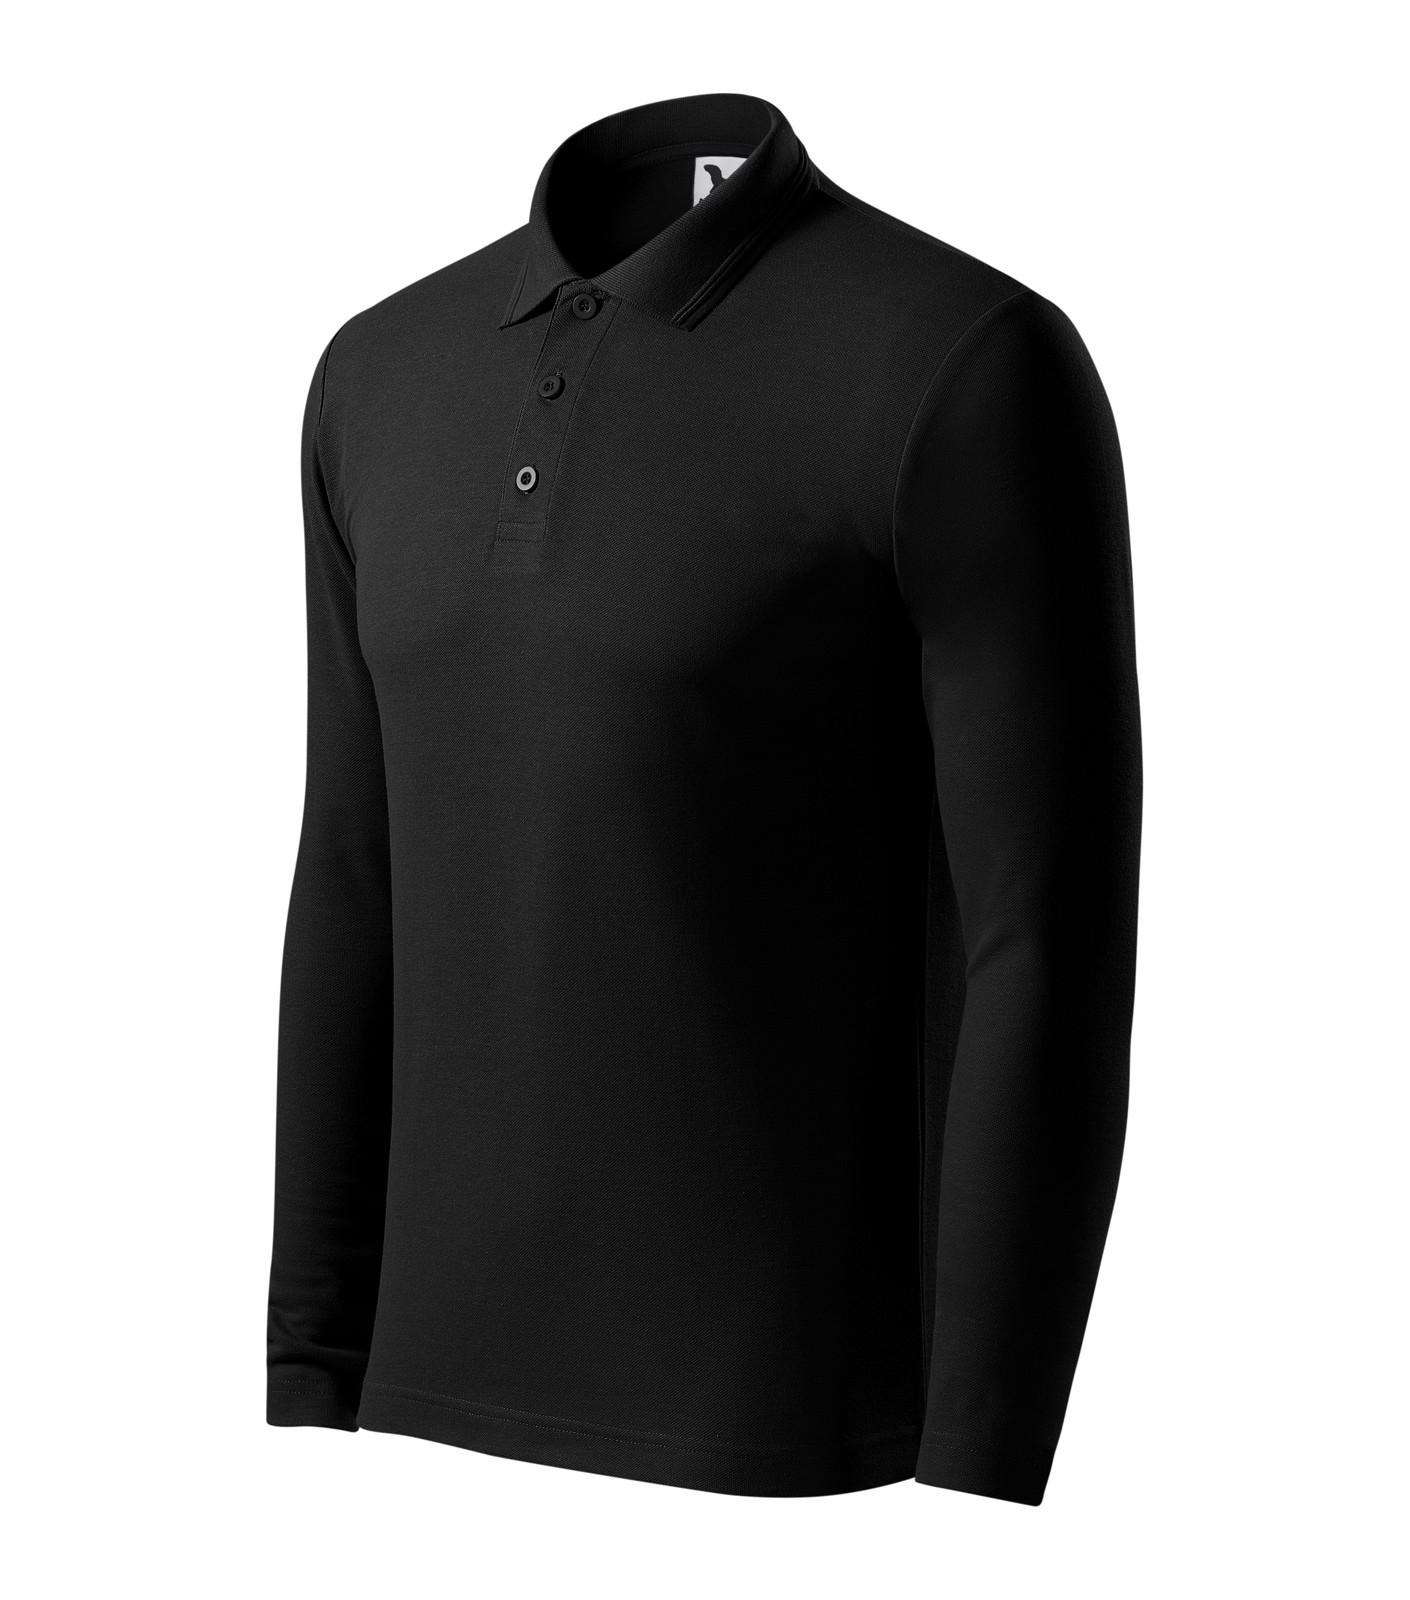 Polo Shirt men's Malfini Pique Polo LS - Black / XL